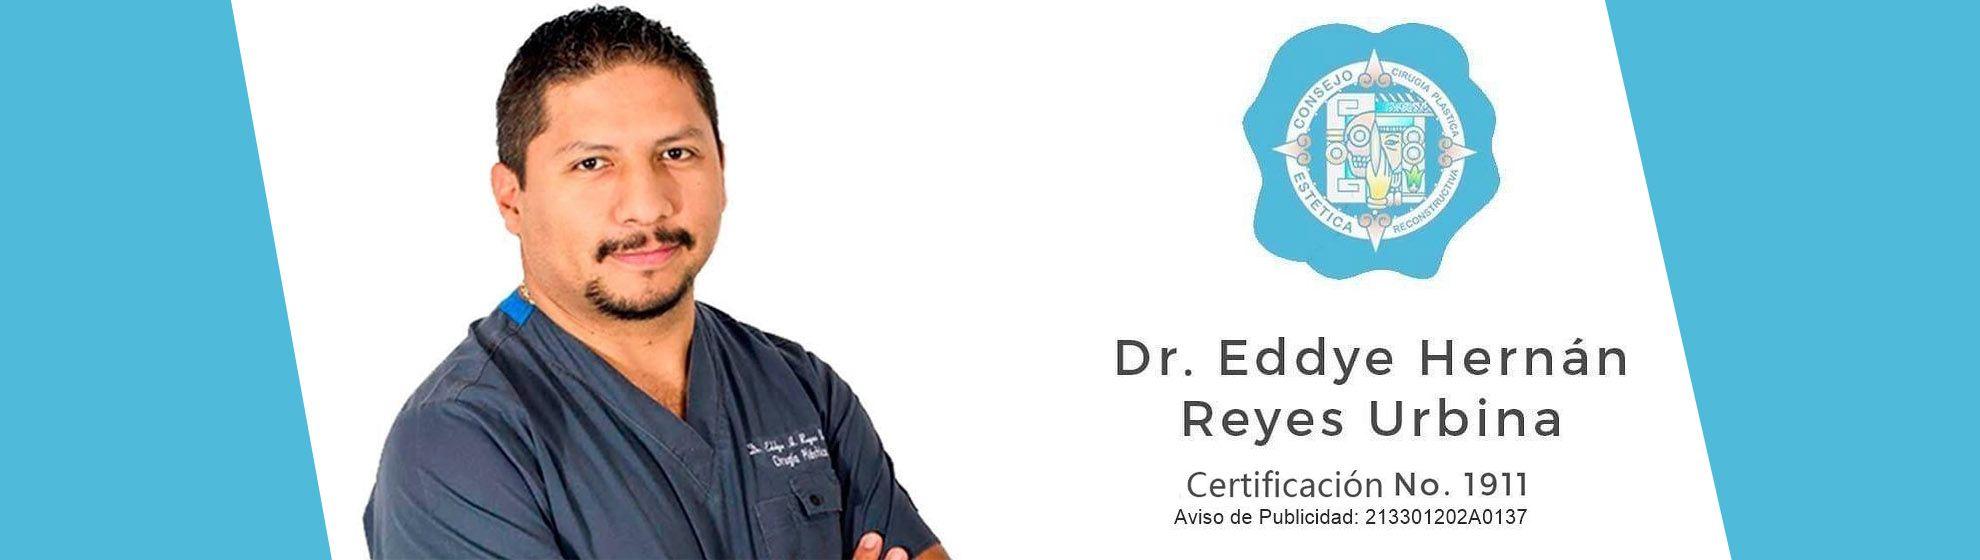 Dr. Eddye Hernán Reyes Urbina